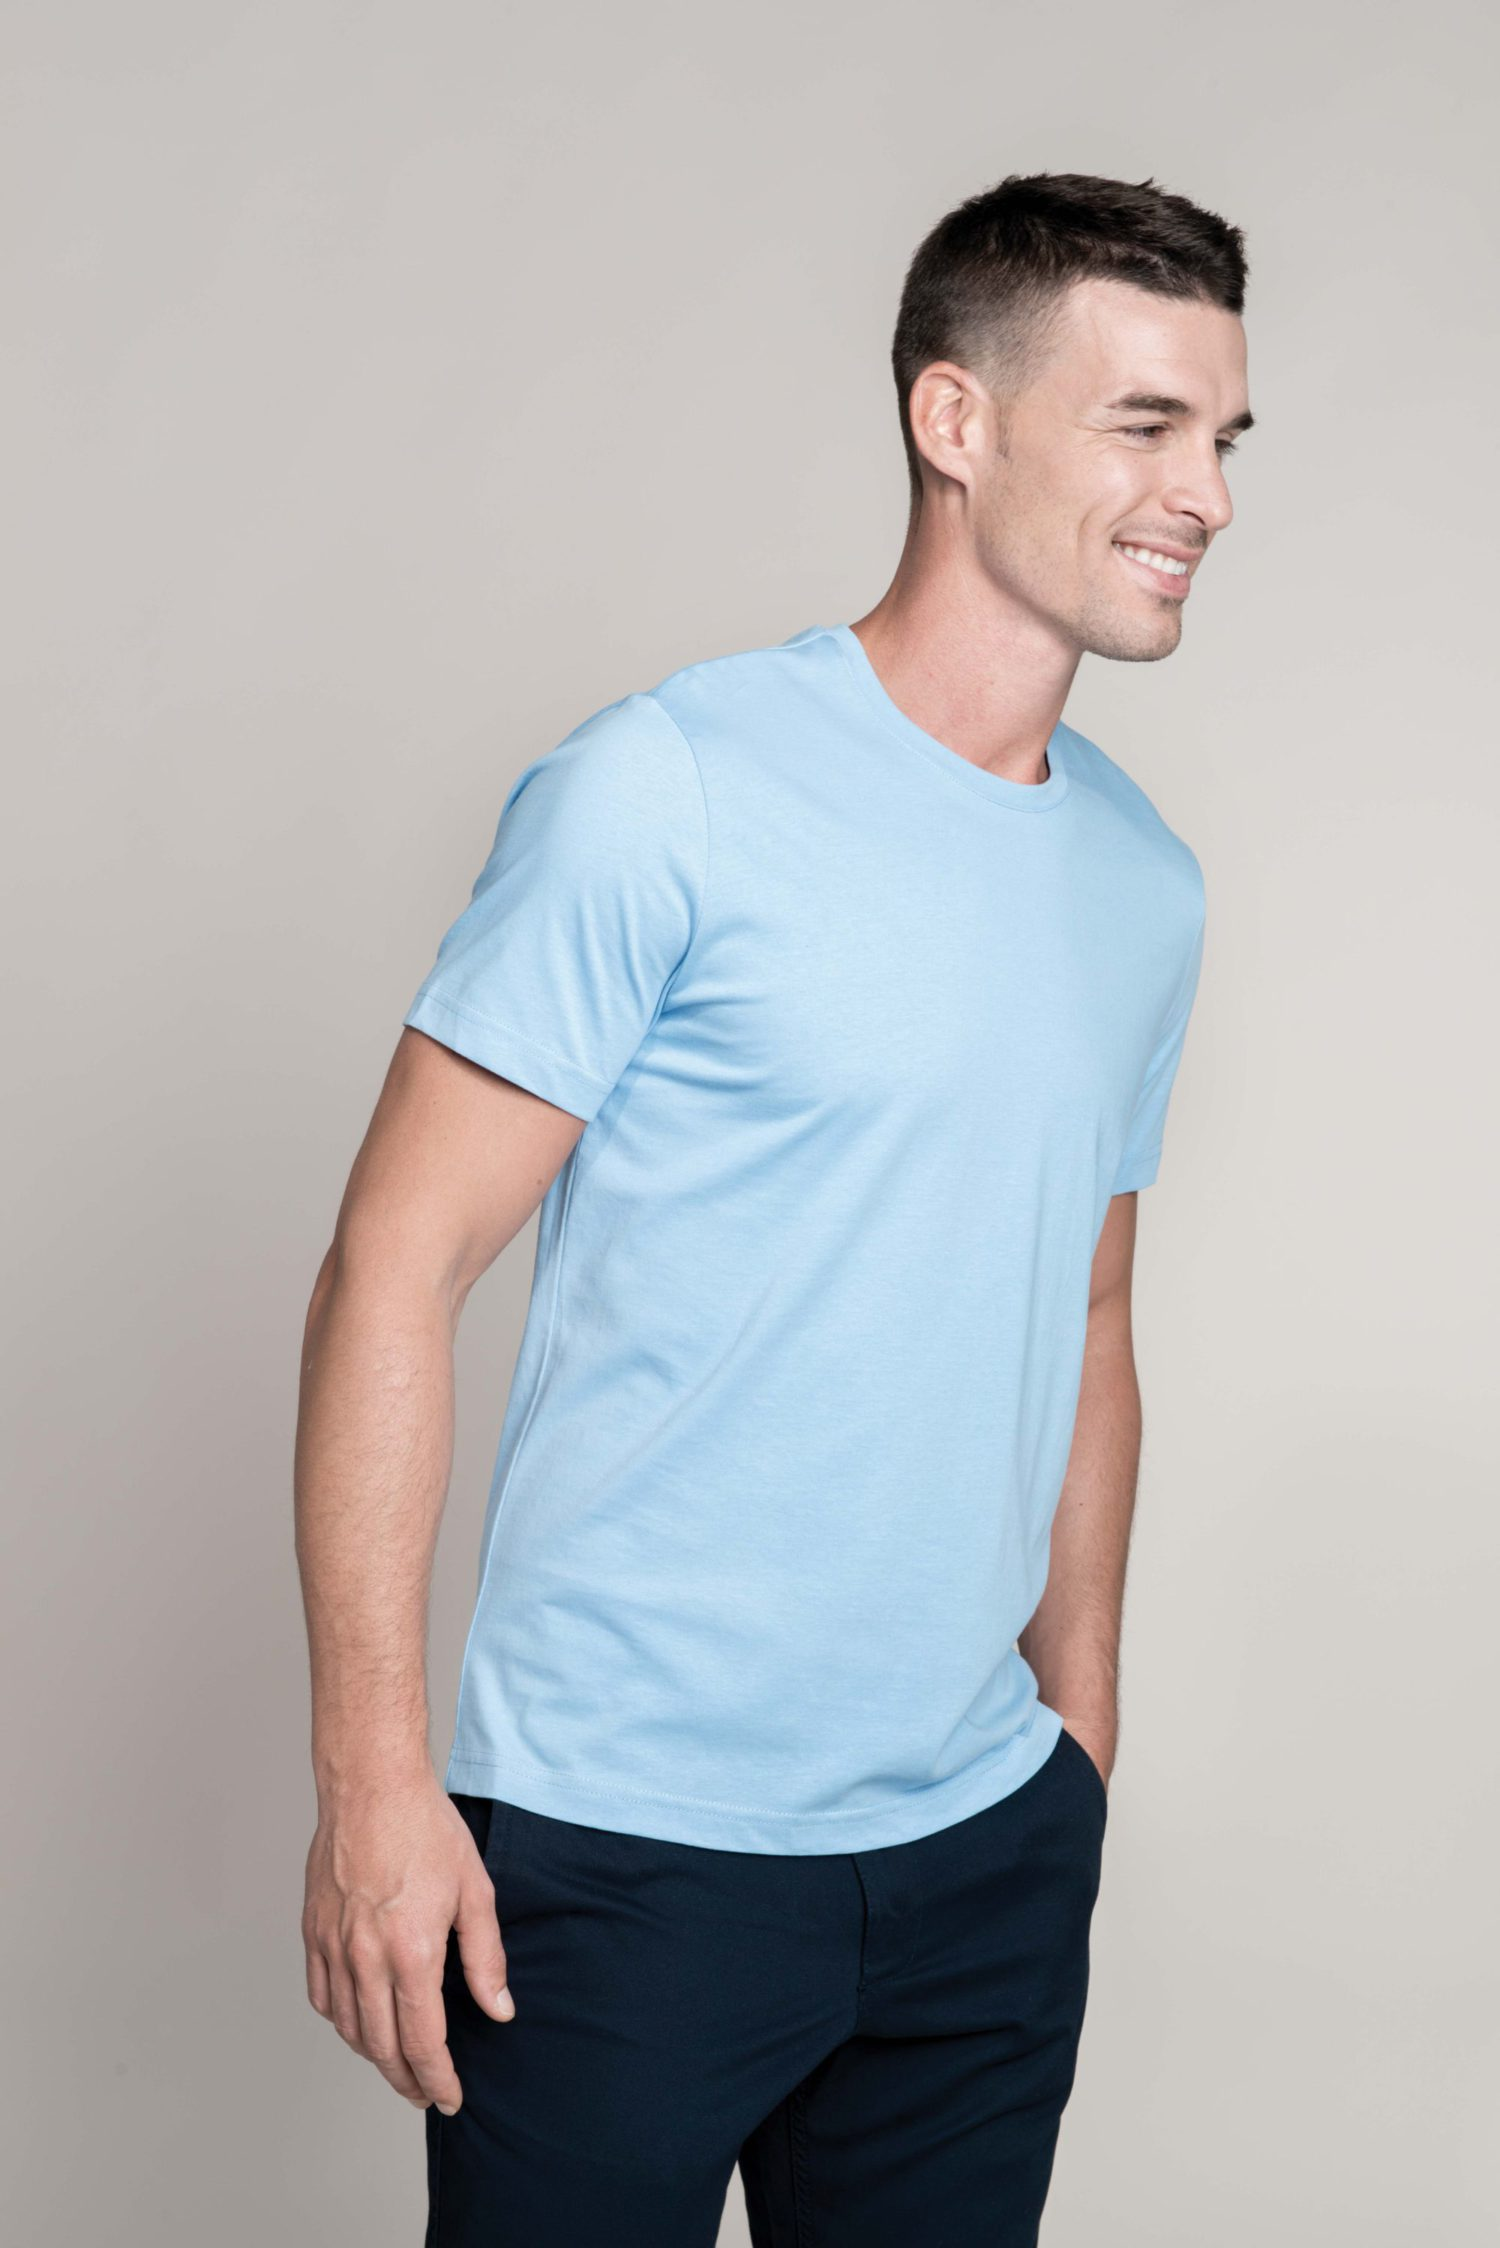 K356 T-Shirt Ronde Hals Korte Mouwen PAS Print Proact